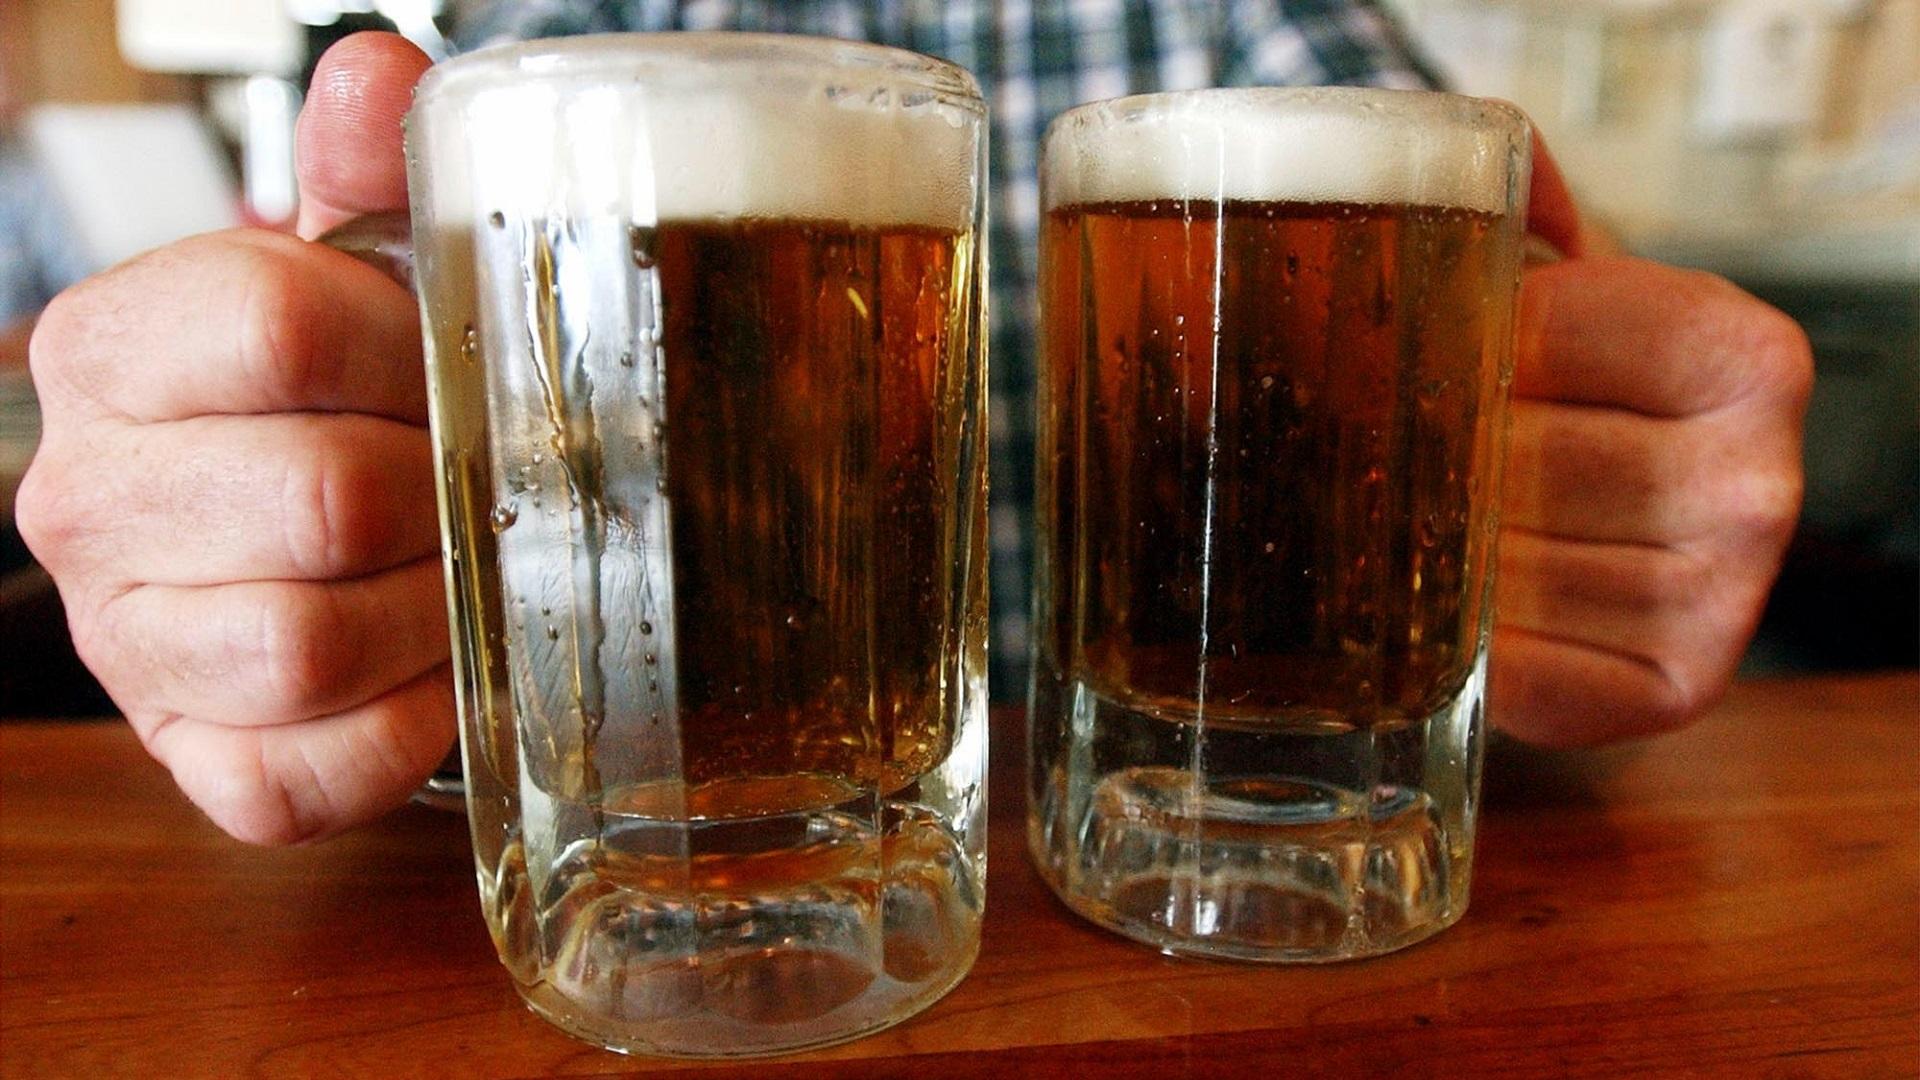 Beer file photo